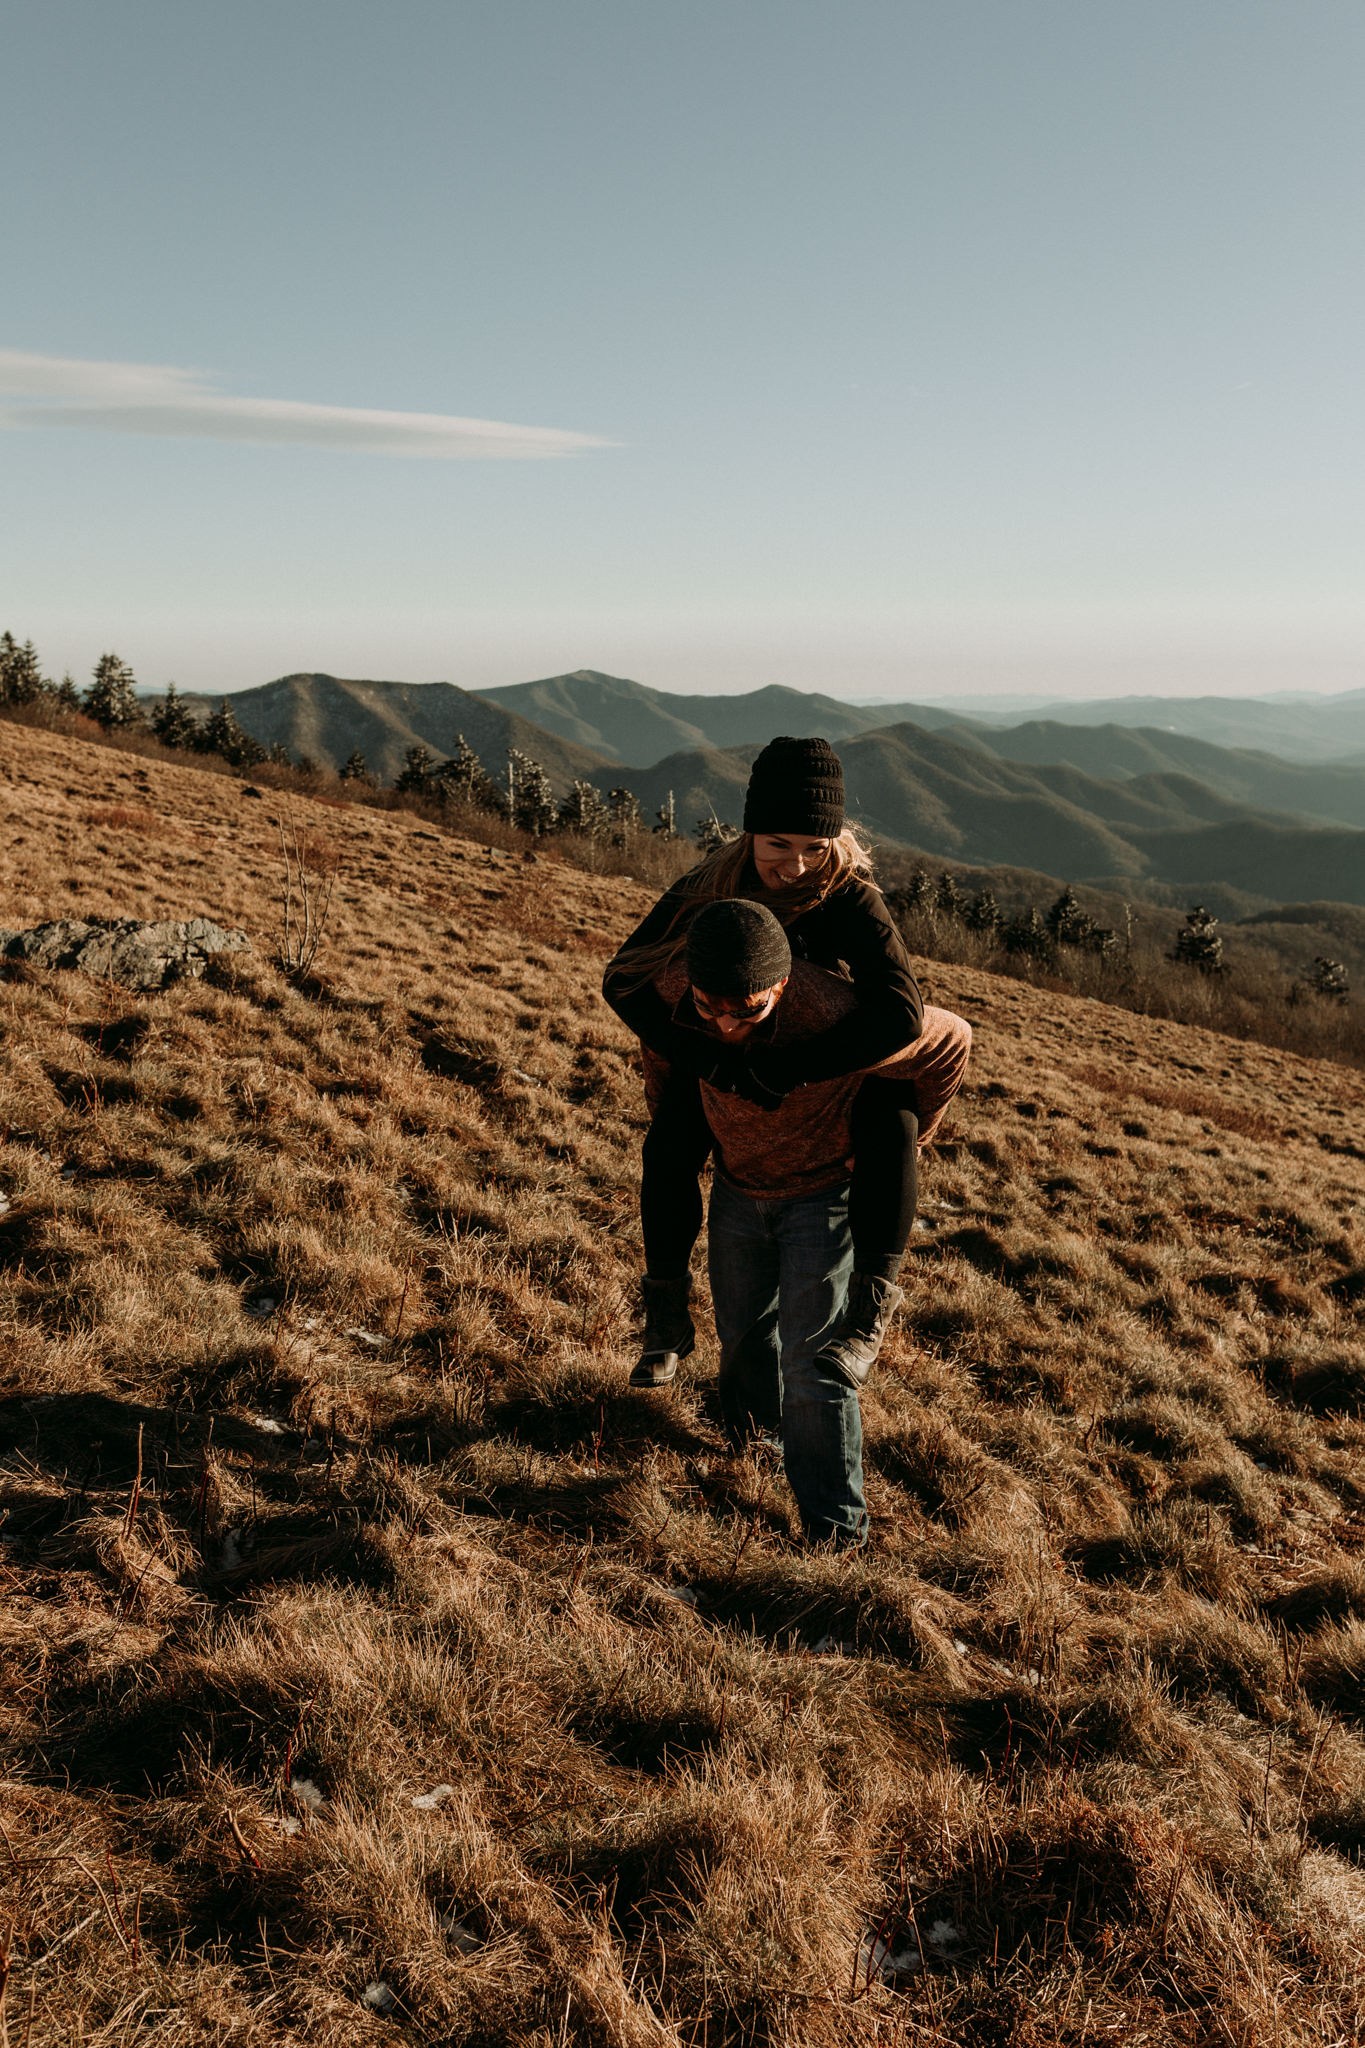 MonicaLeavellPhoto-AshleyMitch-NorthCarolina-Adventure-Engagement-Photographer-25.jpg